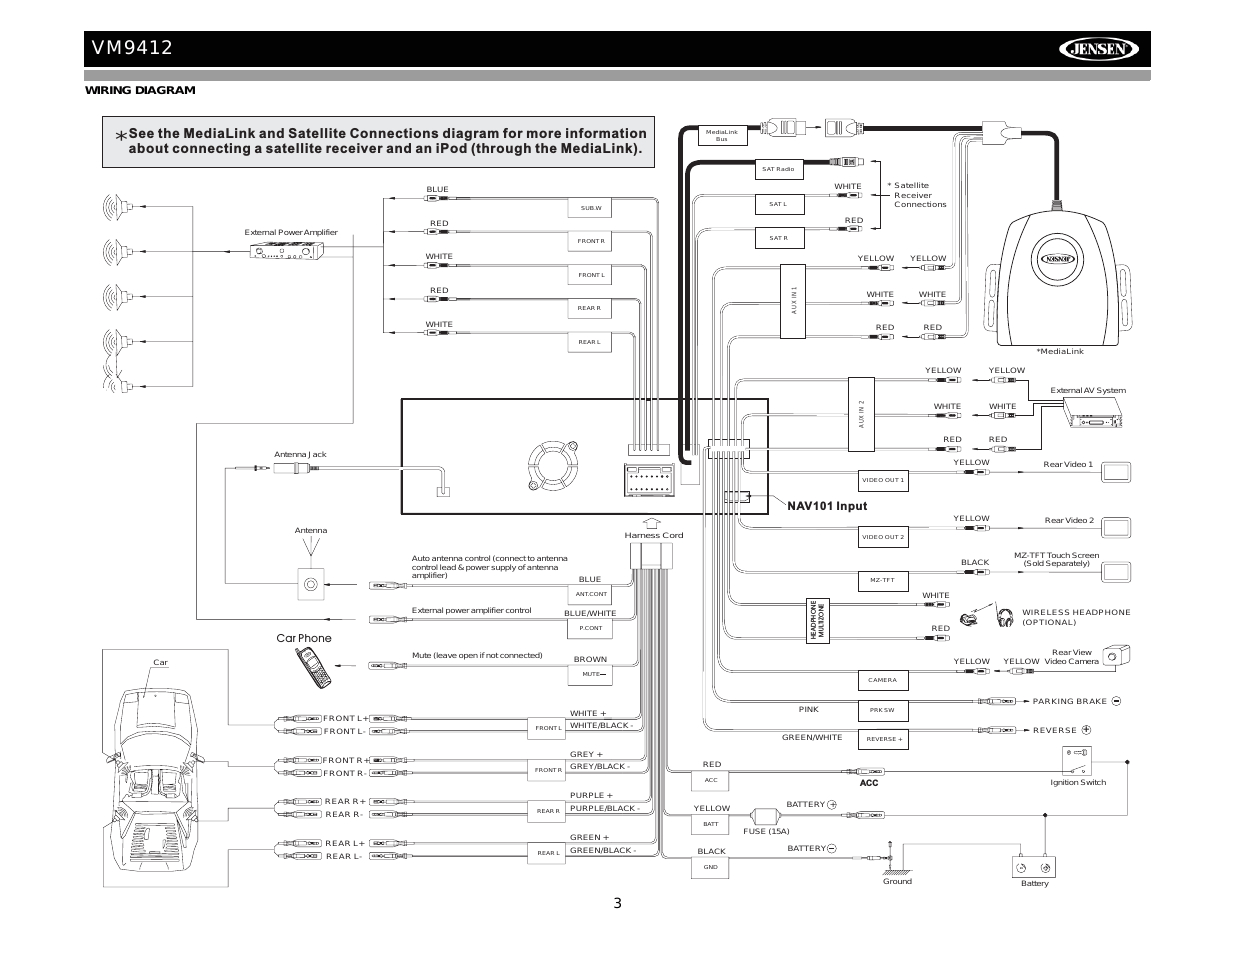 uv10 wiring diagram wiring diagram jensen uv9 wiring harness diagram